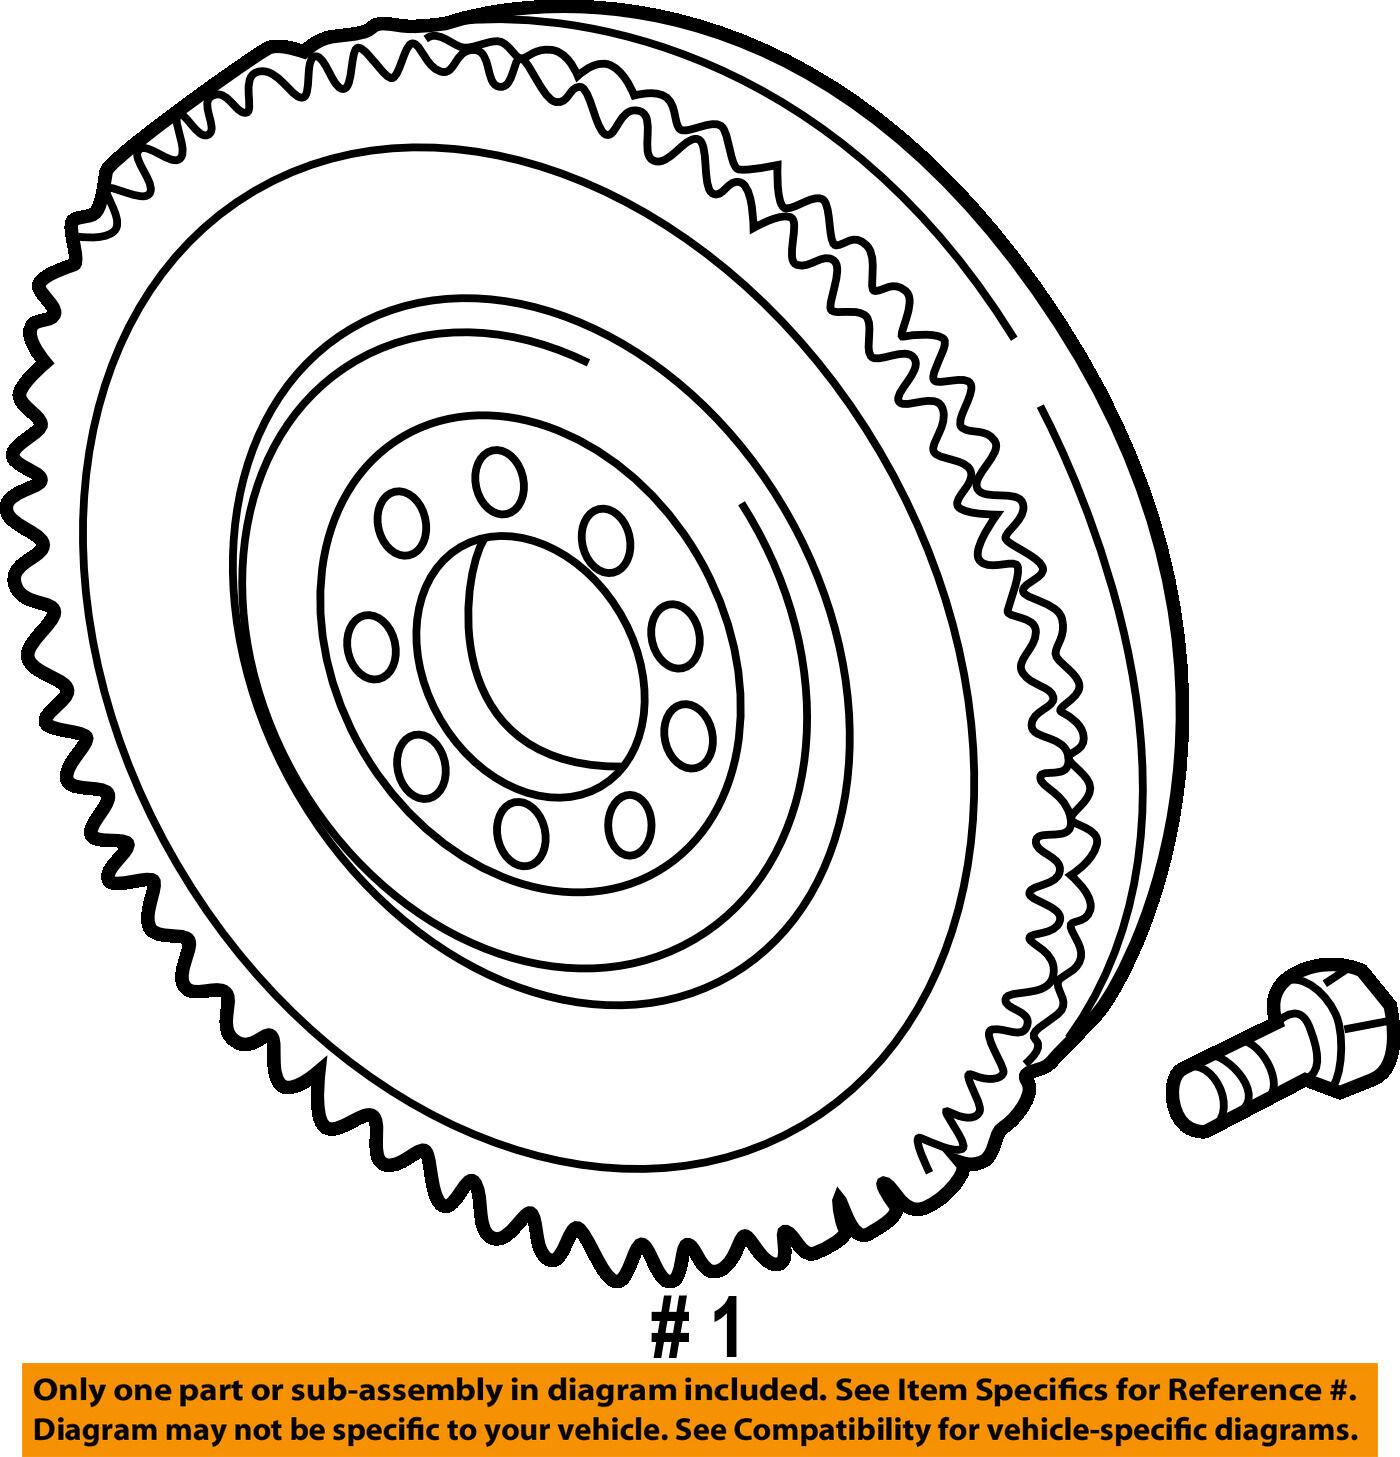 06 10 bmw m6 m5 s85 flywheel oem 21212283060 ebay 91 BMW M5 norton secured powered by verisign